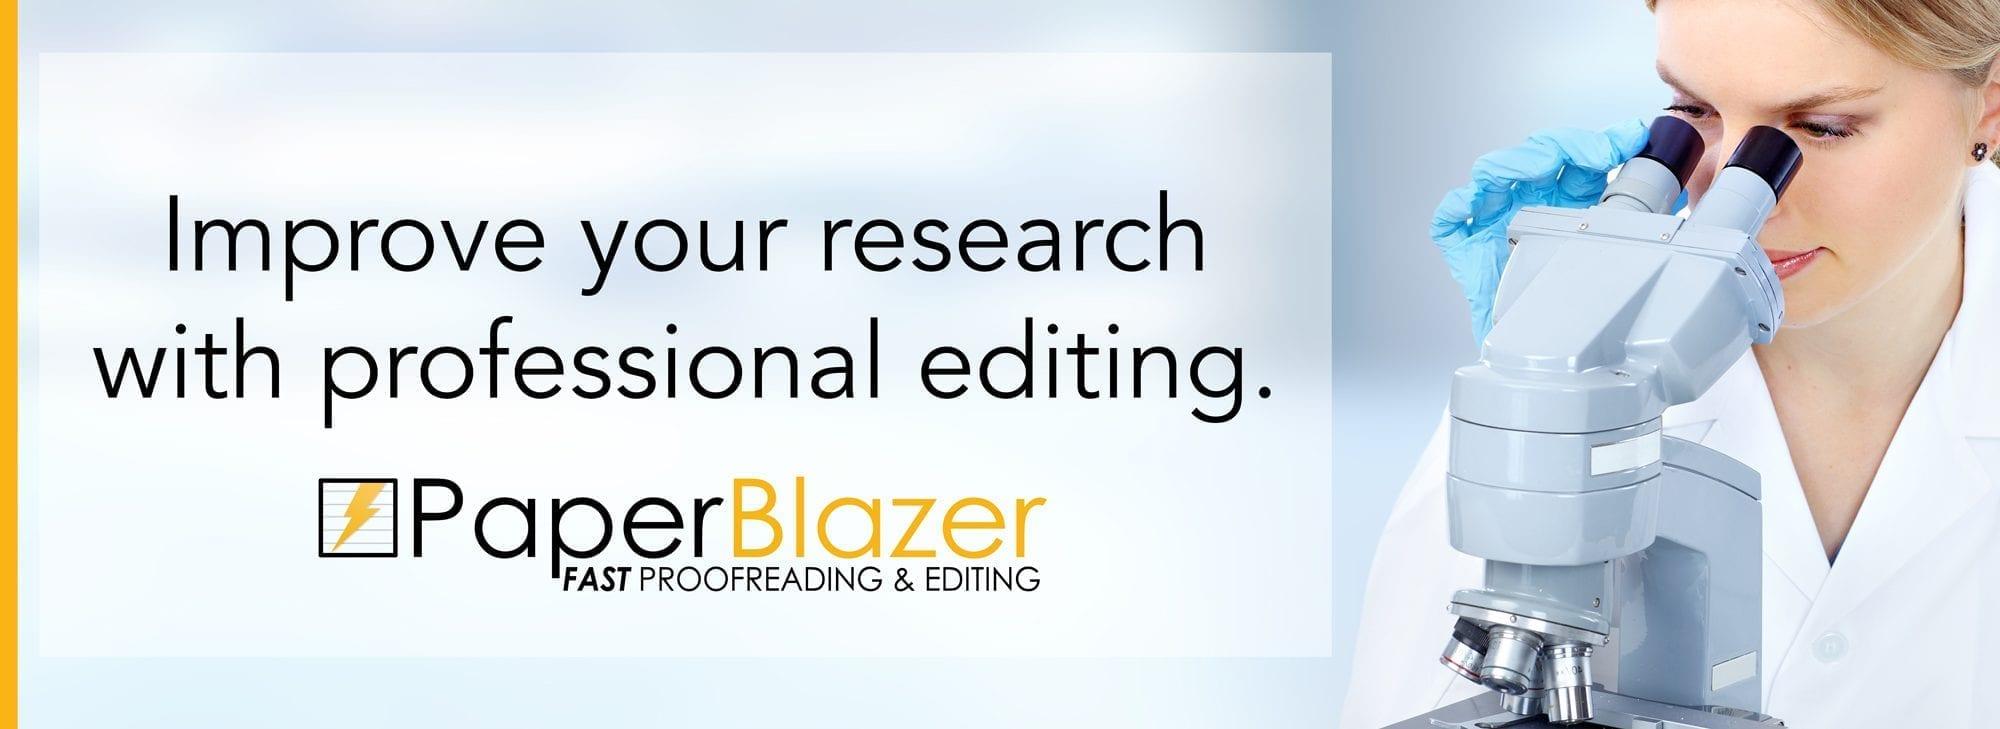 proofreading scientific paper